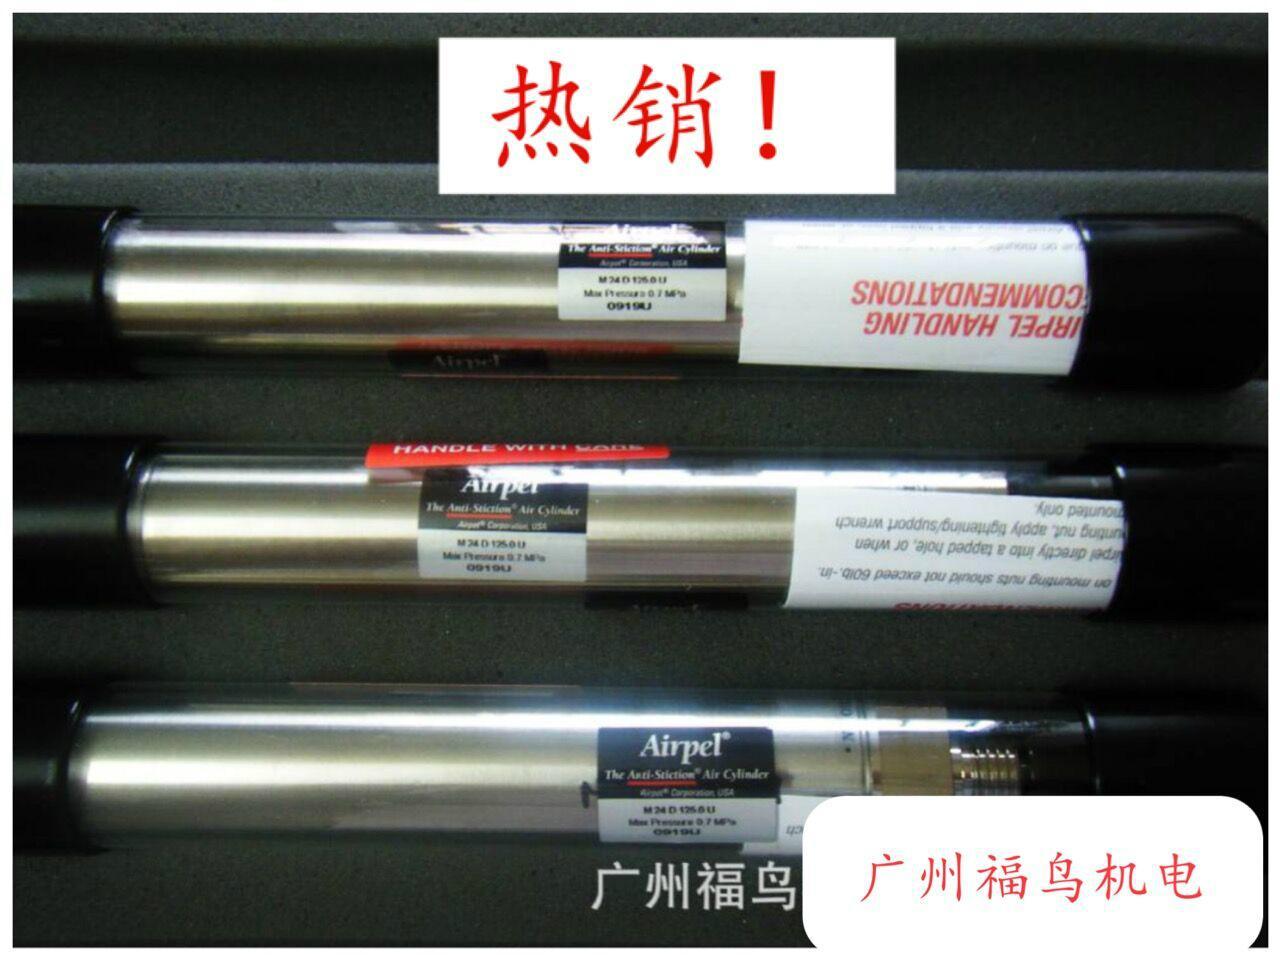 AIRPEL玻璃气缸, 型号: M24D125.0U